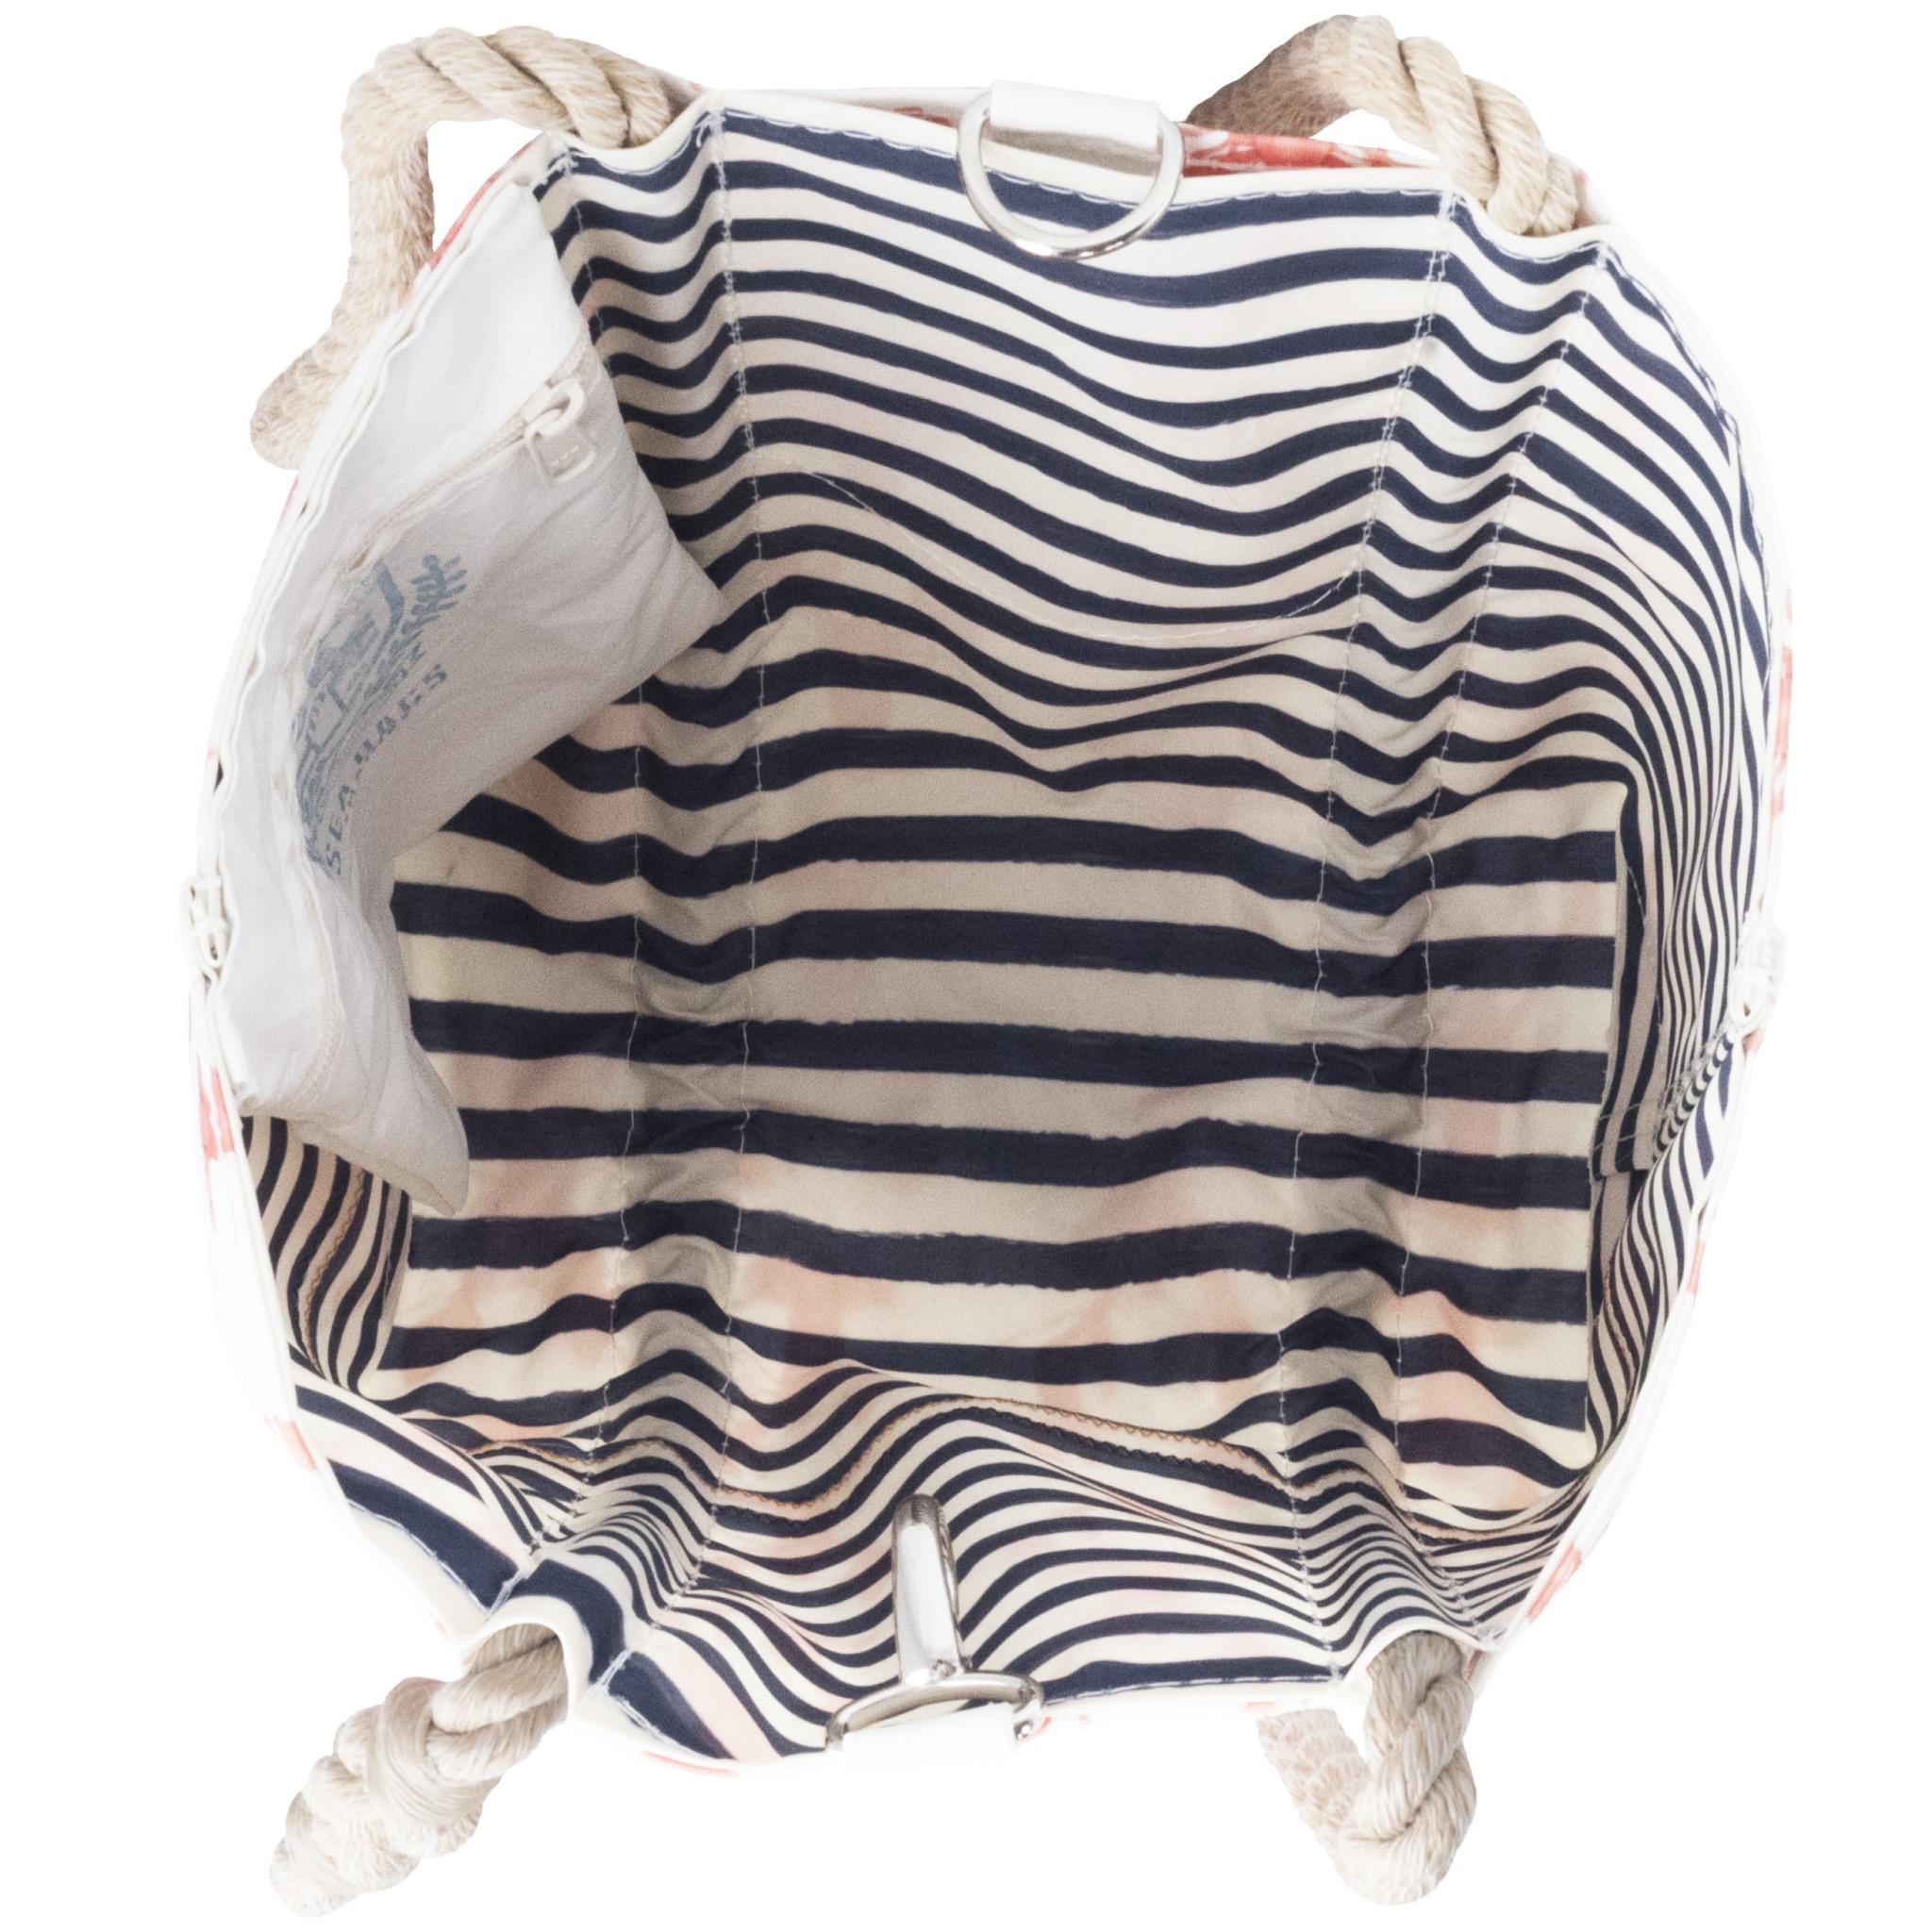 Sea Bags Sara Fitz Lobster Pattern Handbag Tote - Hemp Handle - Small with Clasp